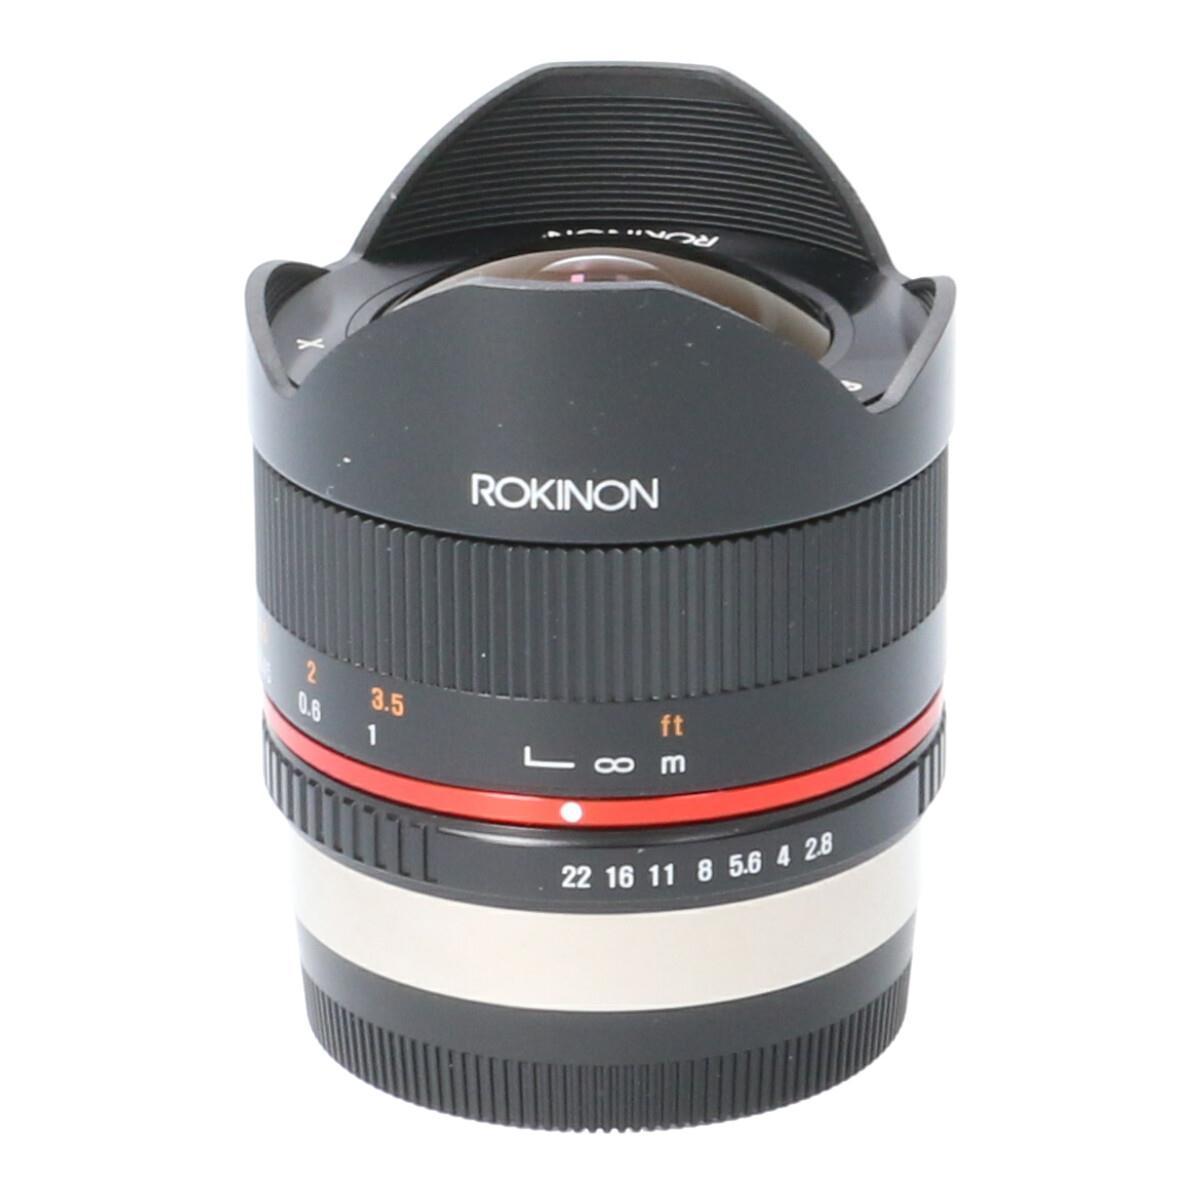 ROKINON フジX8mm F2.8II【中古】